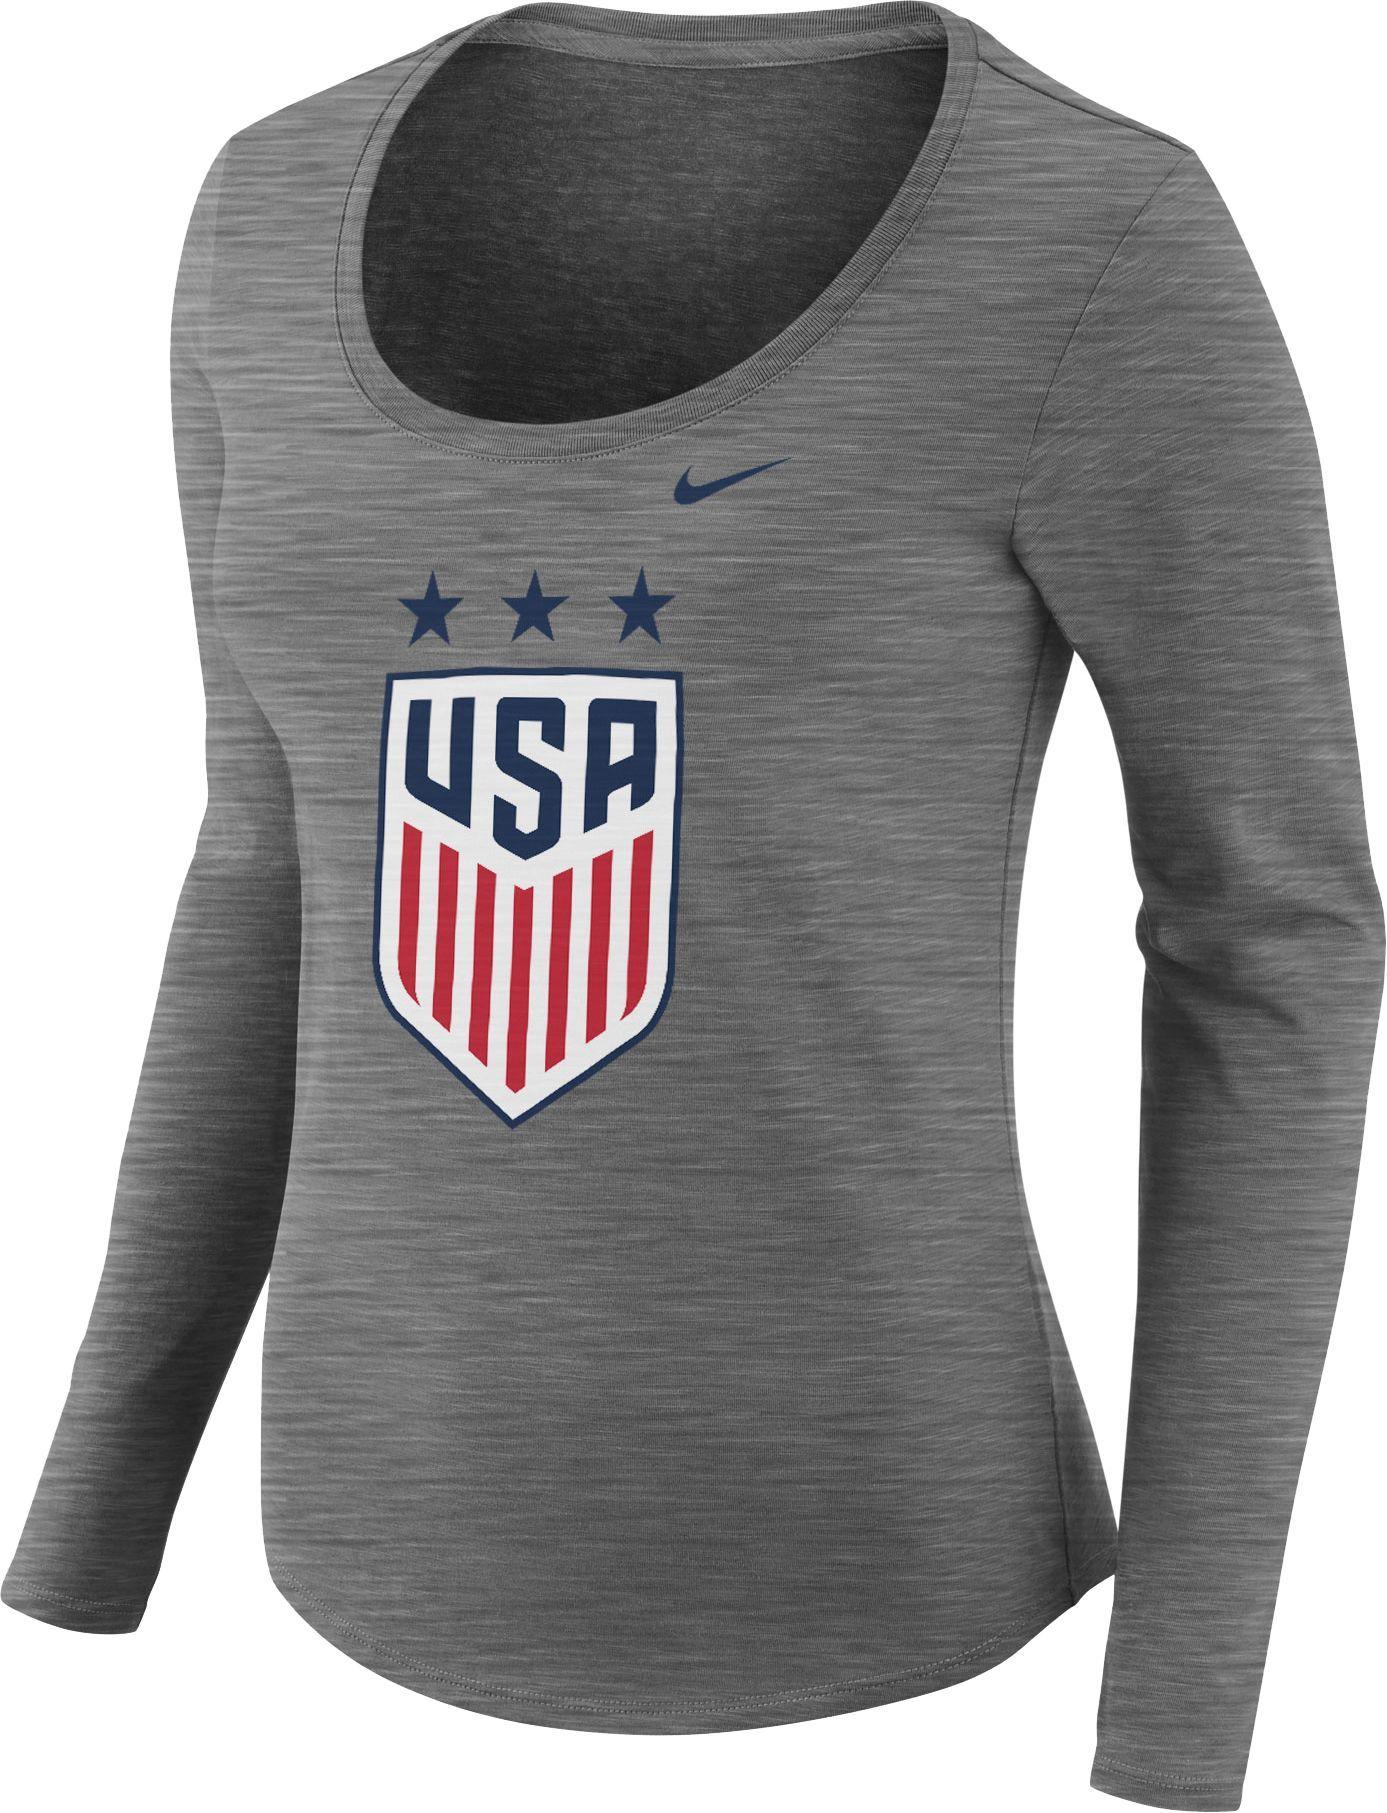 b43101a8 Nike Women's USA Soccer Crest Heather Grey Scoop Neck T-Shirt, Size: XL,  Team